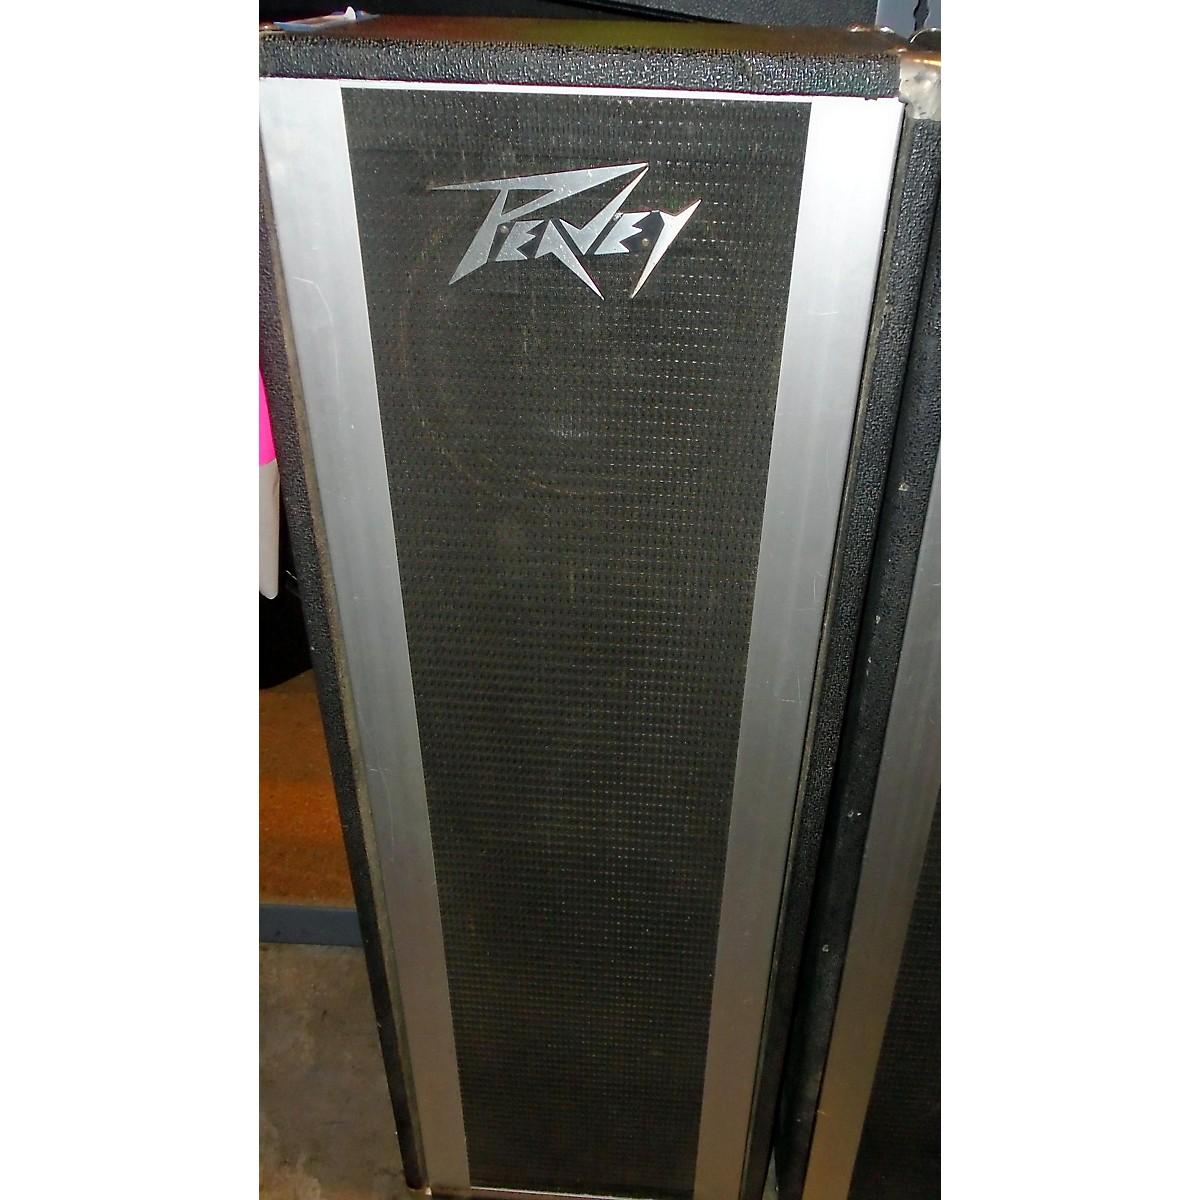 Peavey PA410 Unpowered Speaker